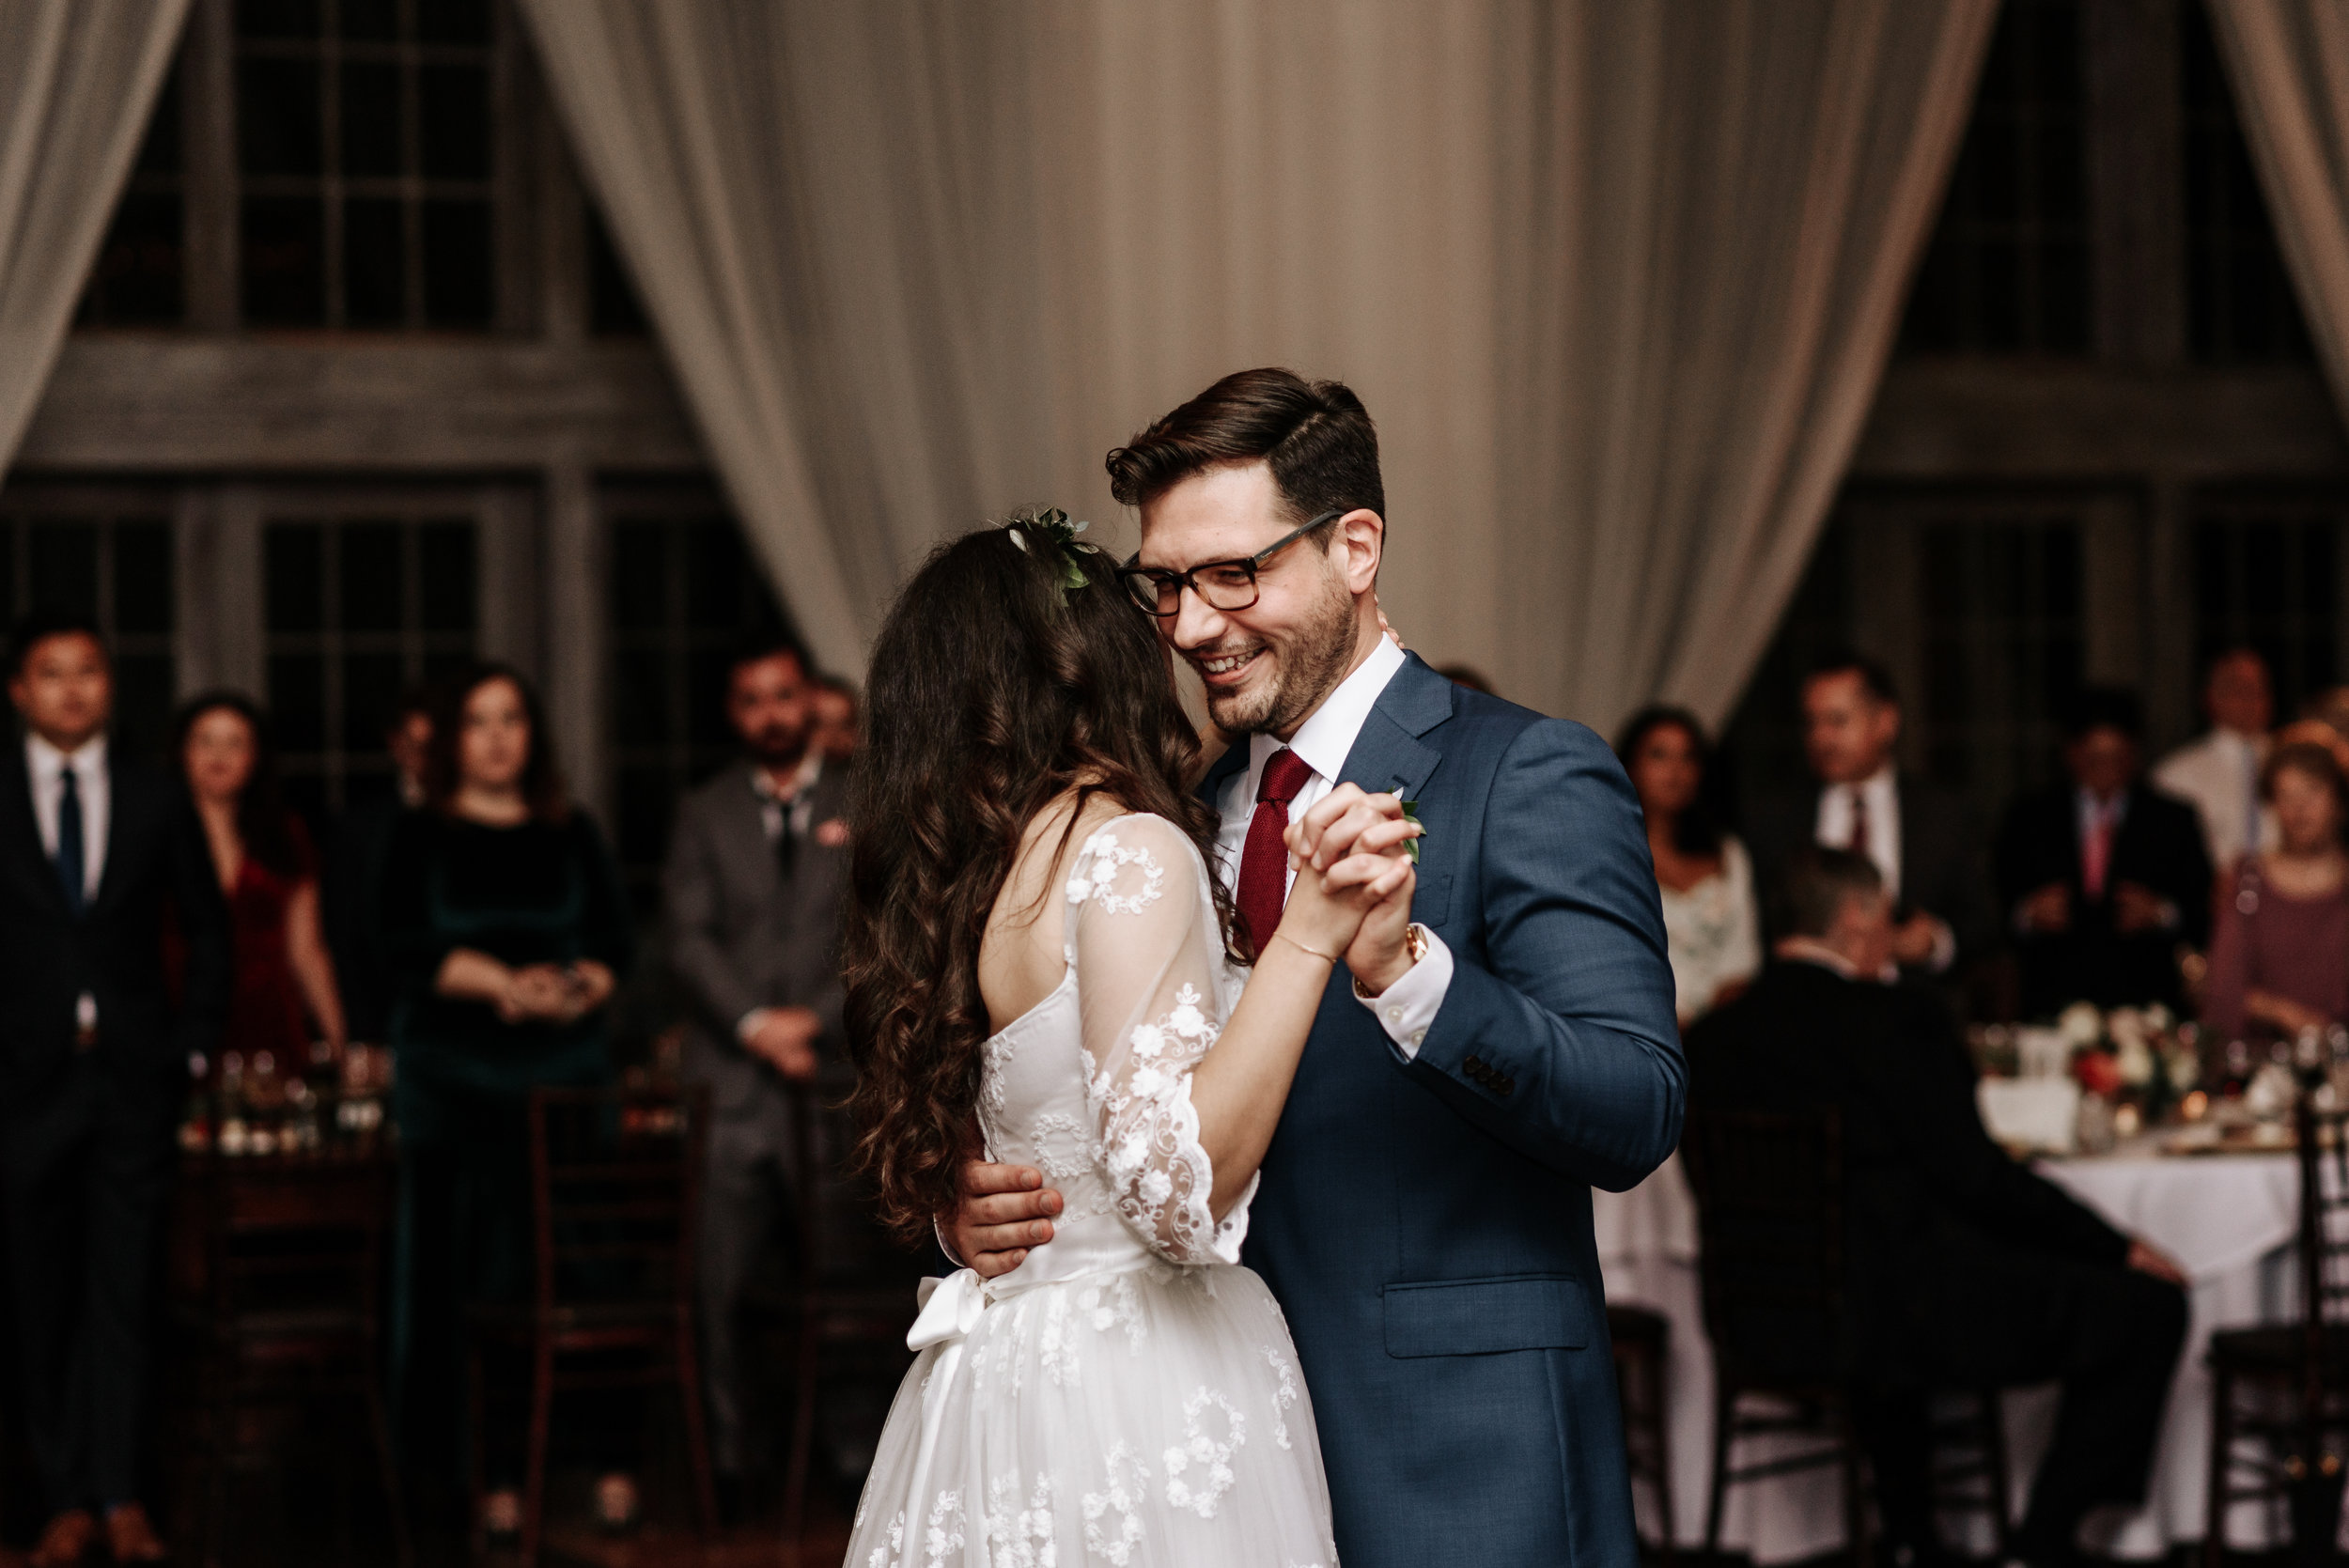 Veritas-Vineyards-and-Winery-Wedding-Photography-Afton-Virginia-Yasmin-Seth-Photography-by-V-3027.jpg